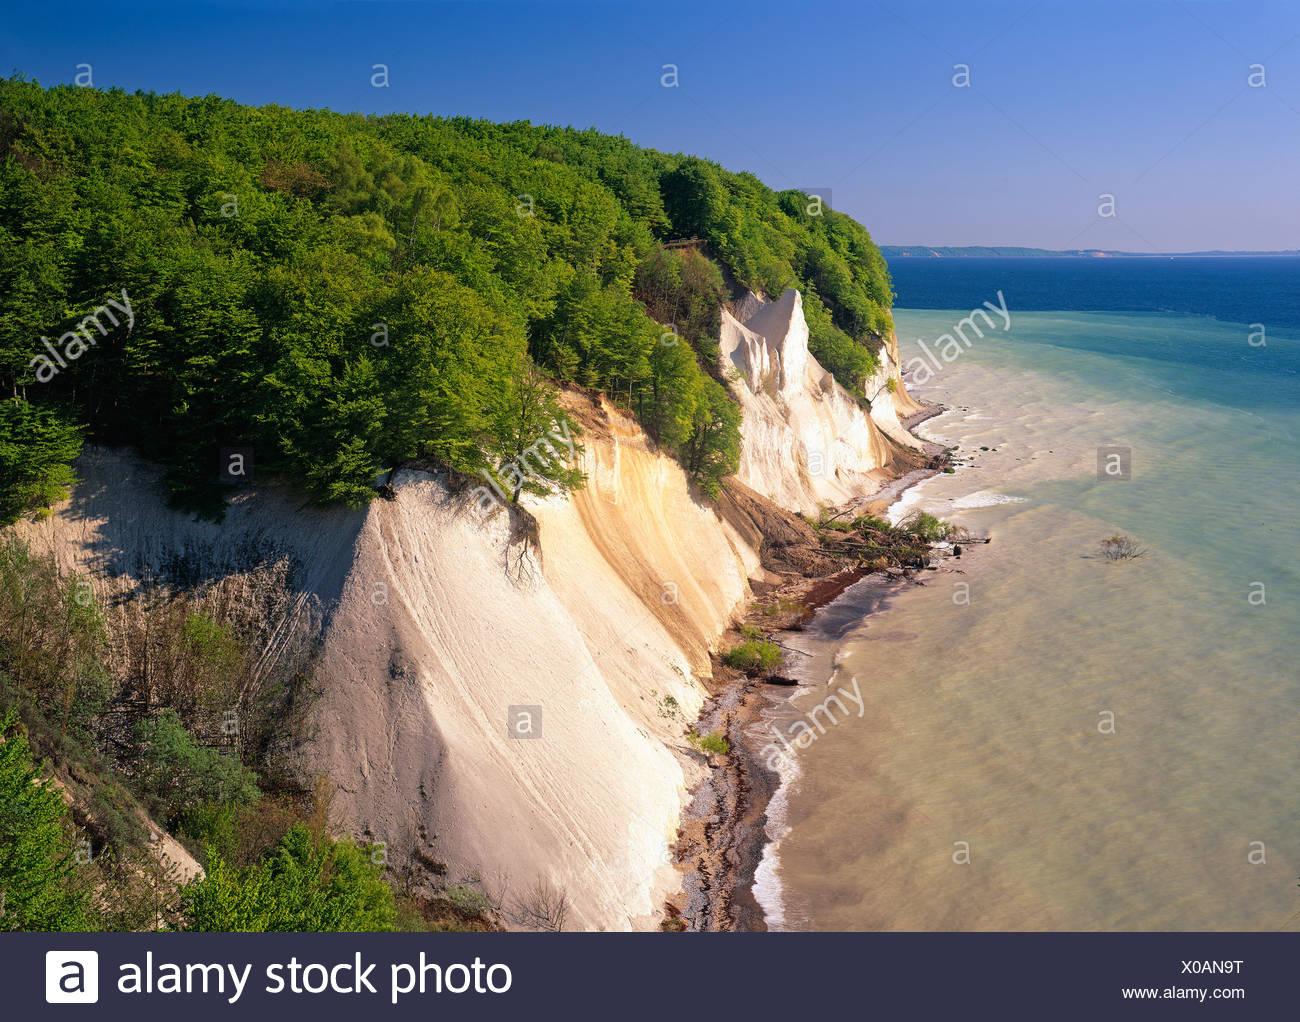 Chalk cliffs on the coast, Jasmund National Park, Ruegen, Mecklenburg-Western Pomerania, Germany, Europe Stock Photo